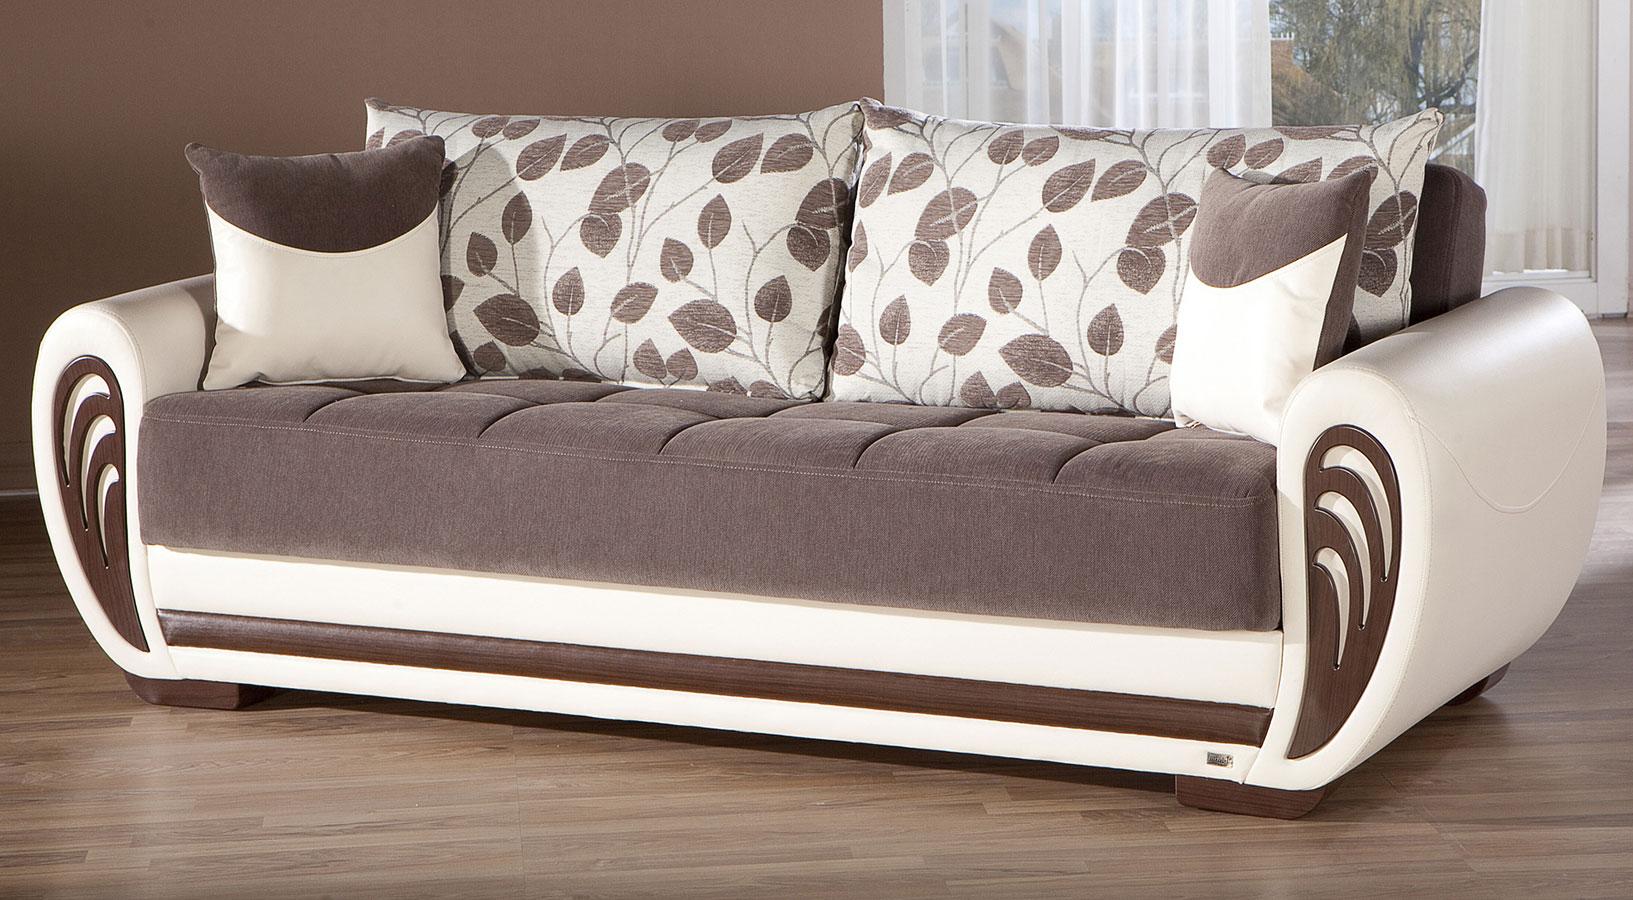 Marina 3 Seat Sleeper Armori Brown Istikbal Furniture Furniture Cart